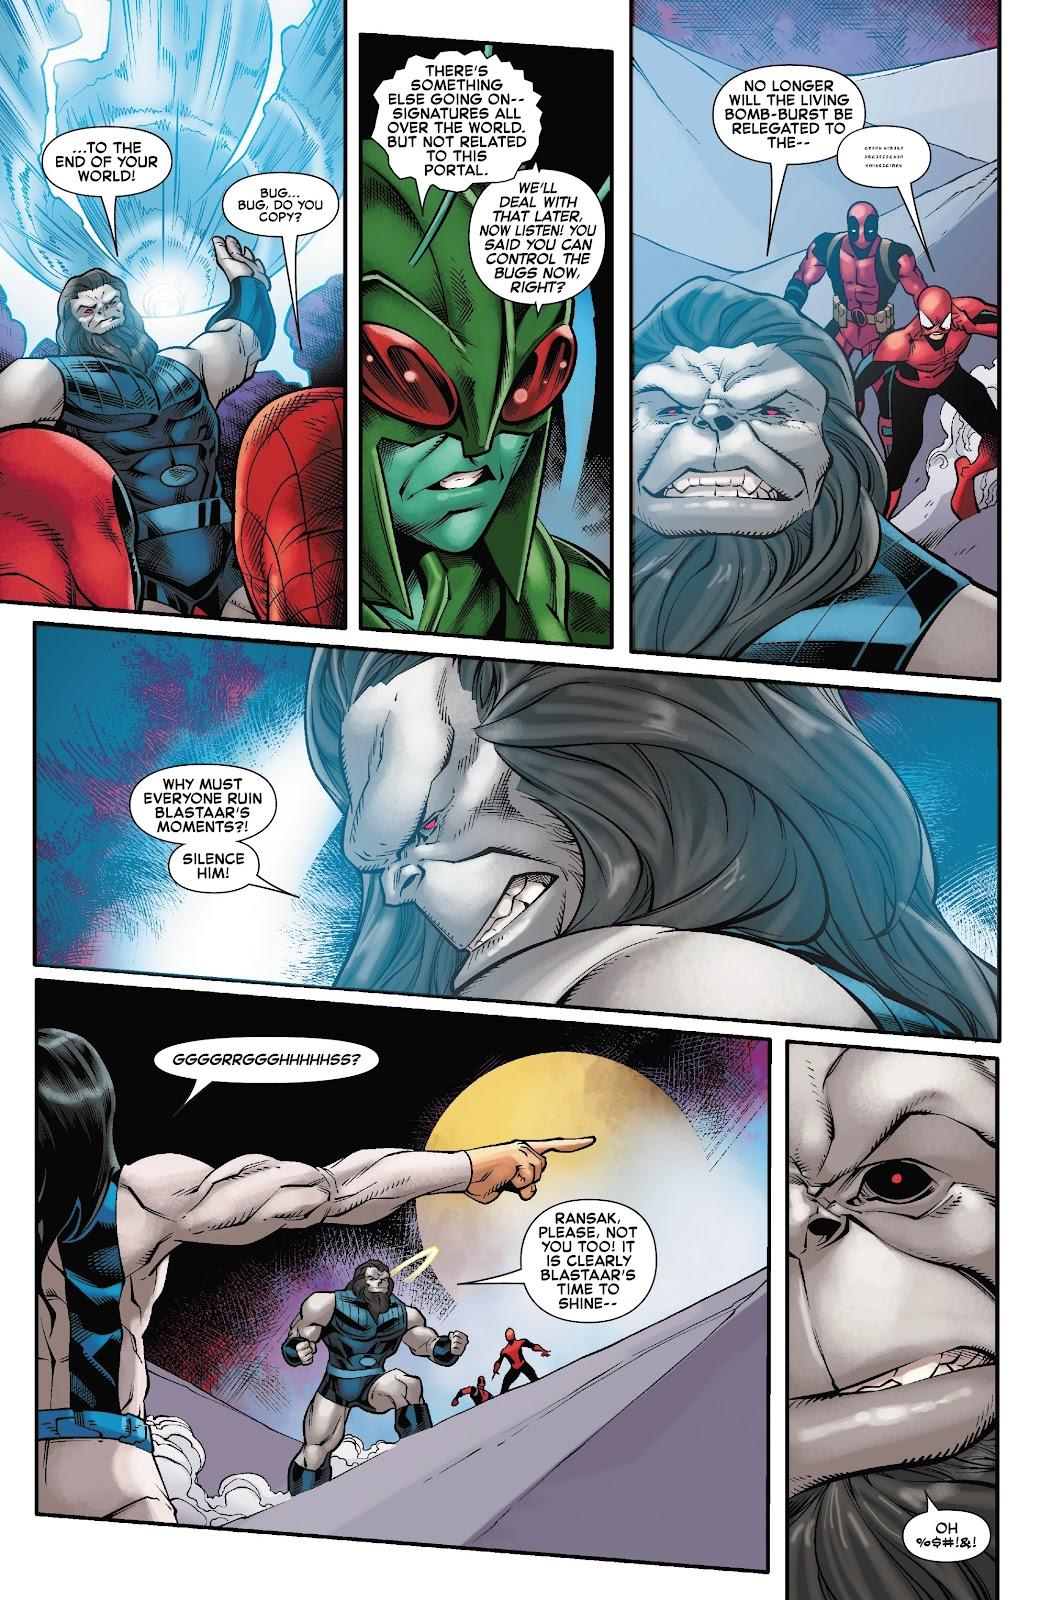 Read online Spider-Man/Deadpool comic -  Issue #45 - 15